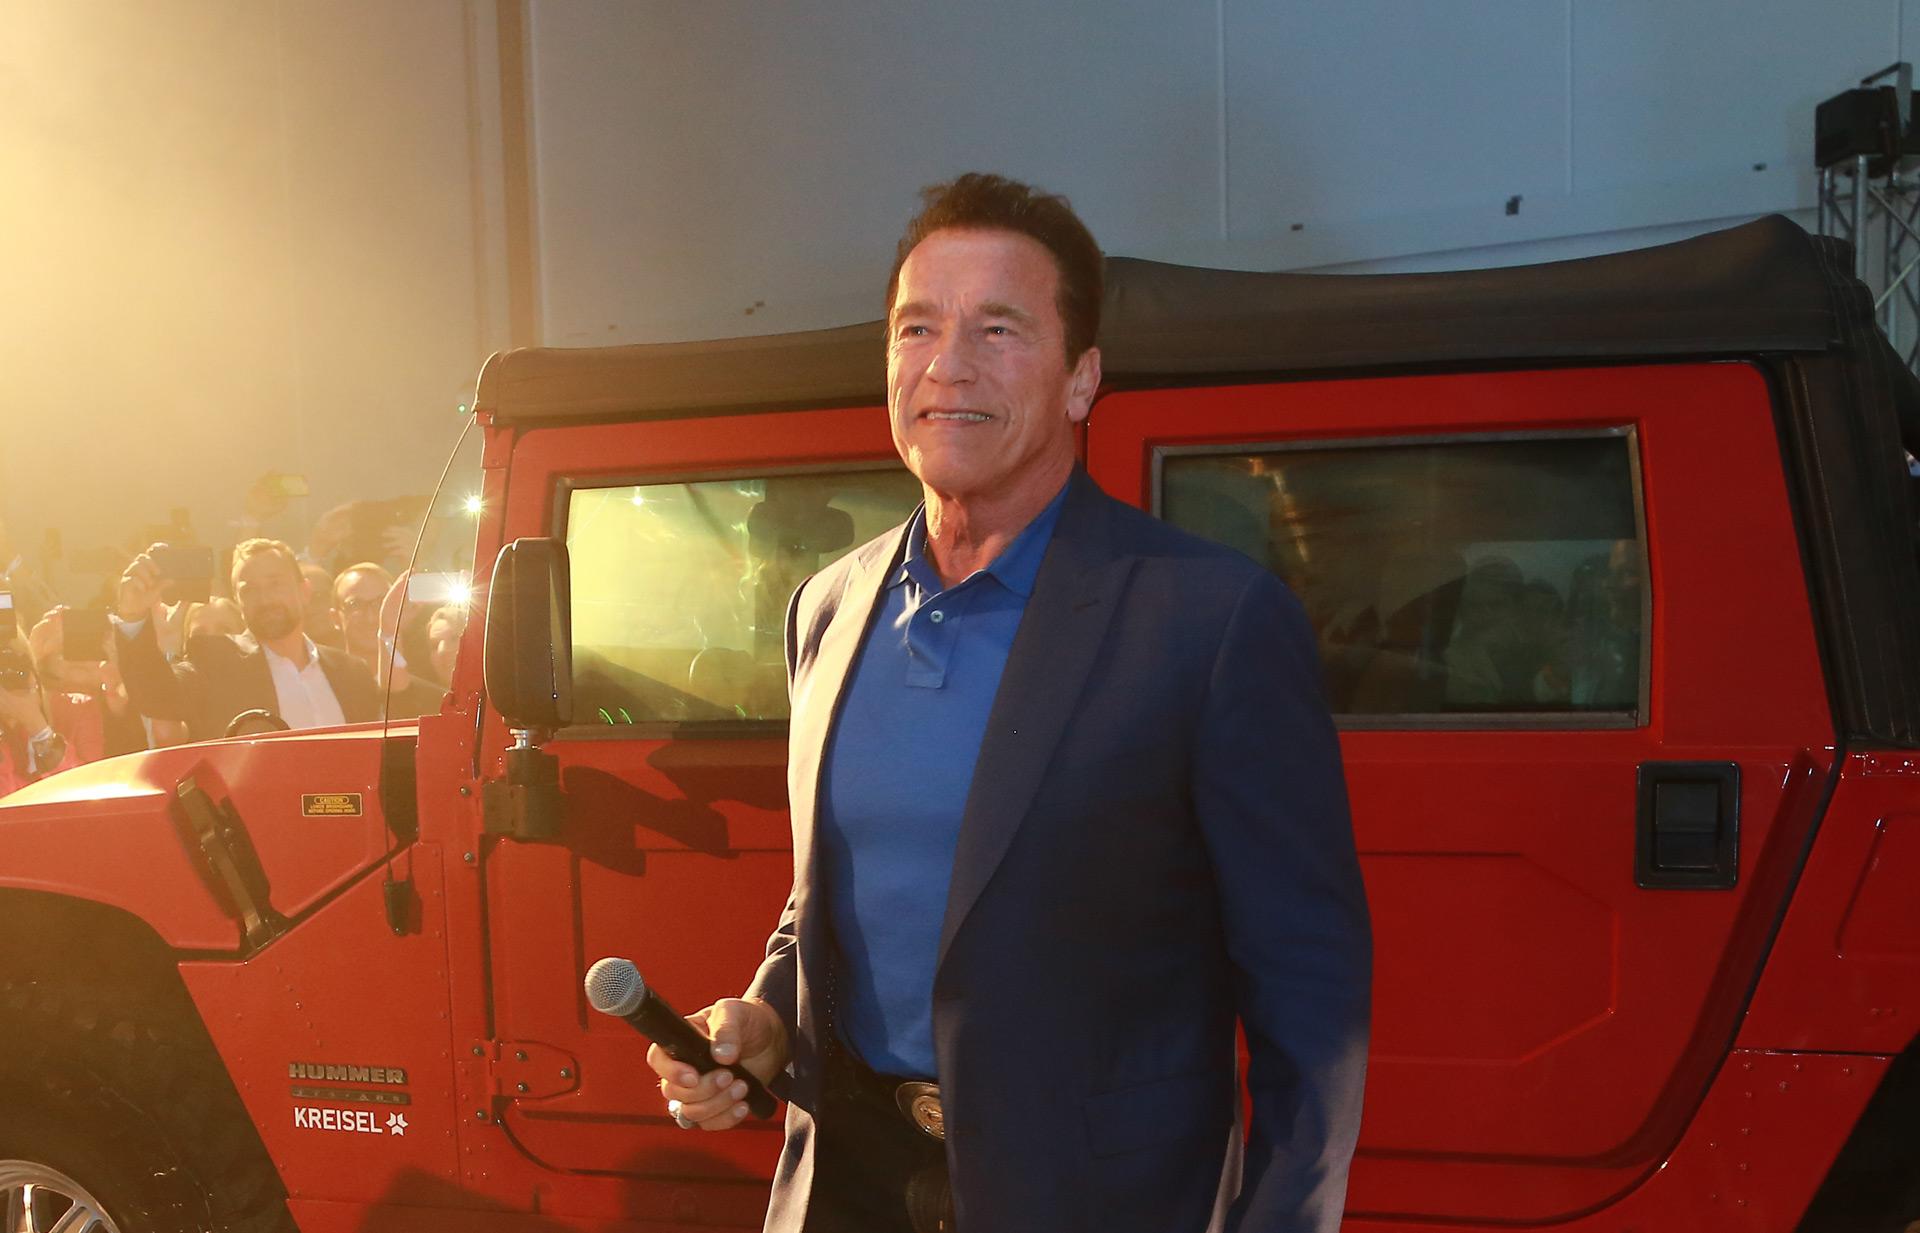 Arnold Schwarzenegger S Dream Of An Electric Hummer H1 Comes True Thanks To Kreisel